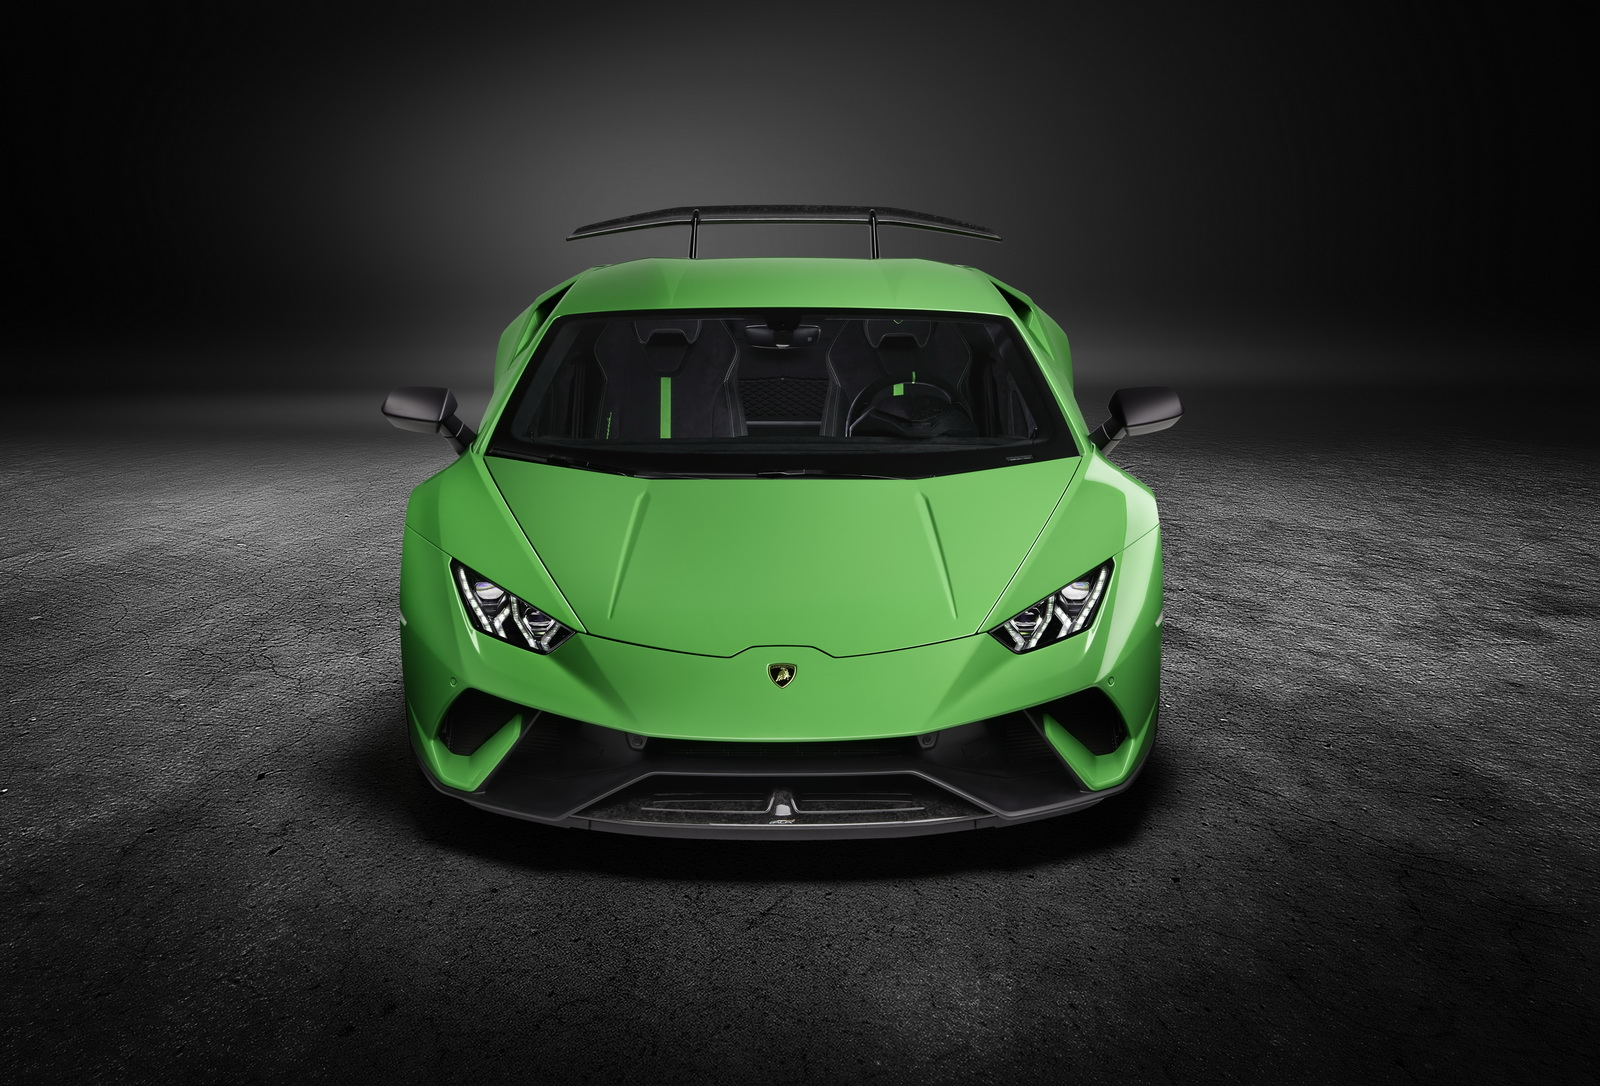 Lamborghini Huracan Performante 2018 (3)